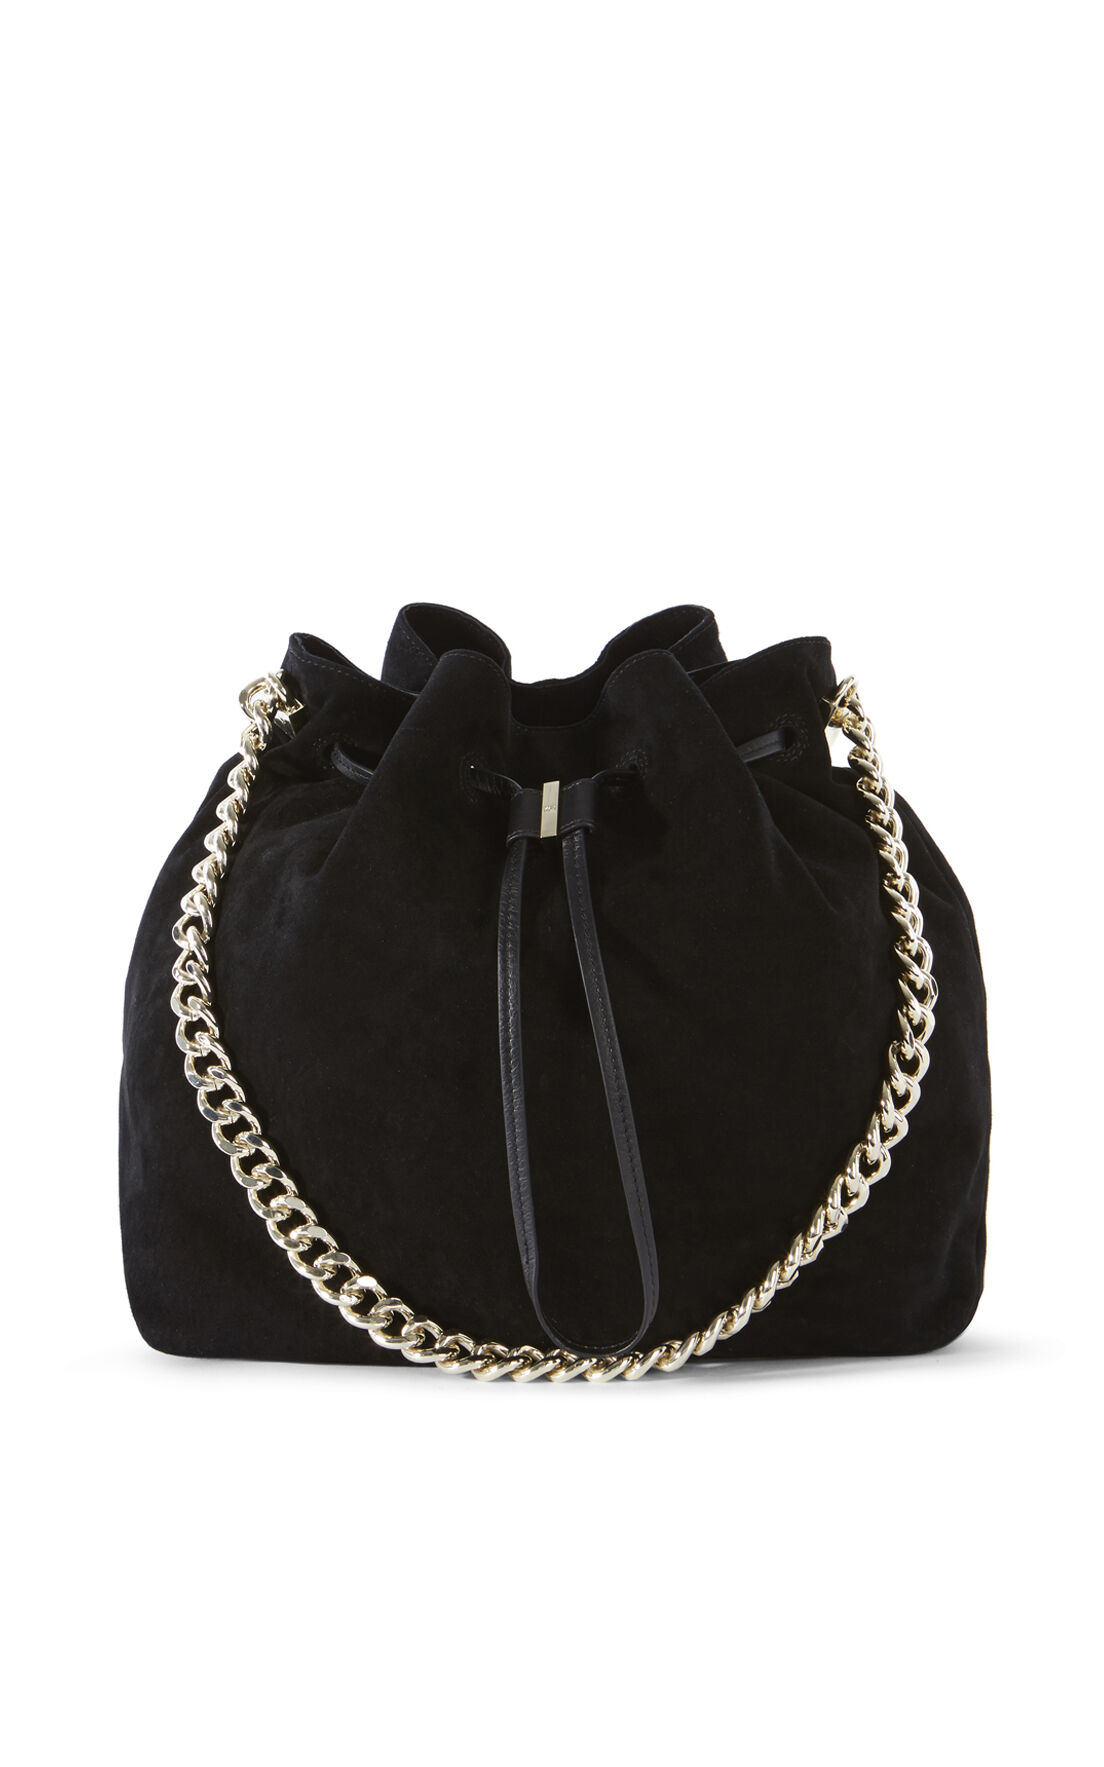 Karen Millen, SUEDE DRAWSTRING BAG Black 0